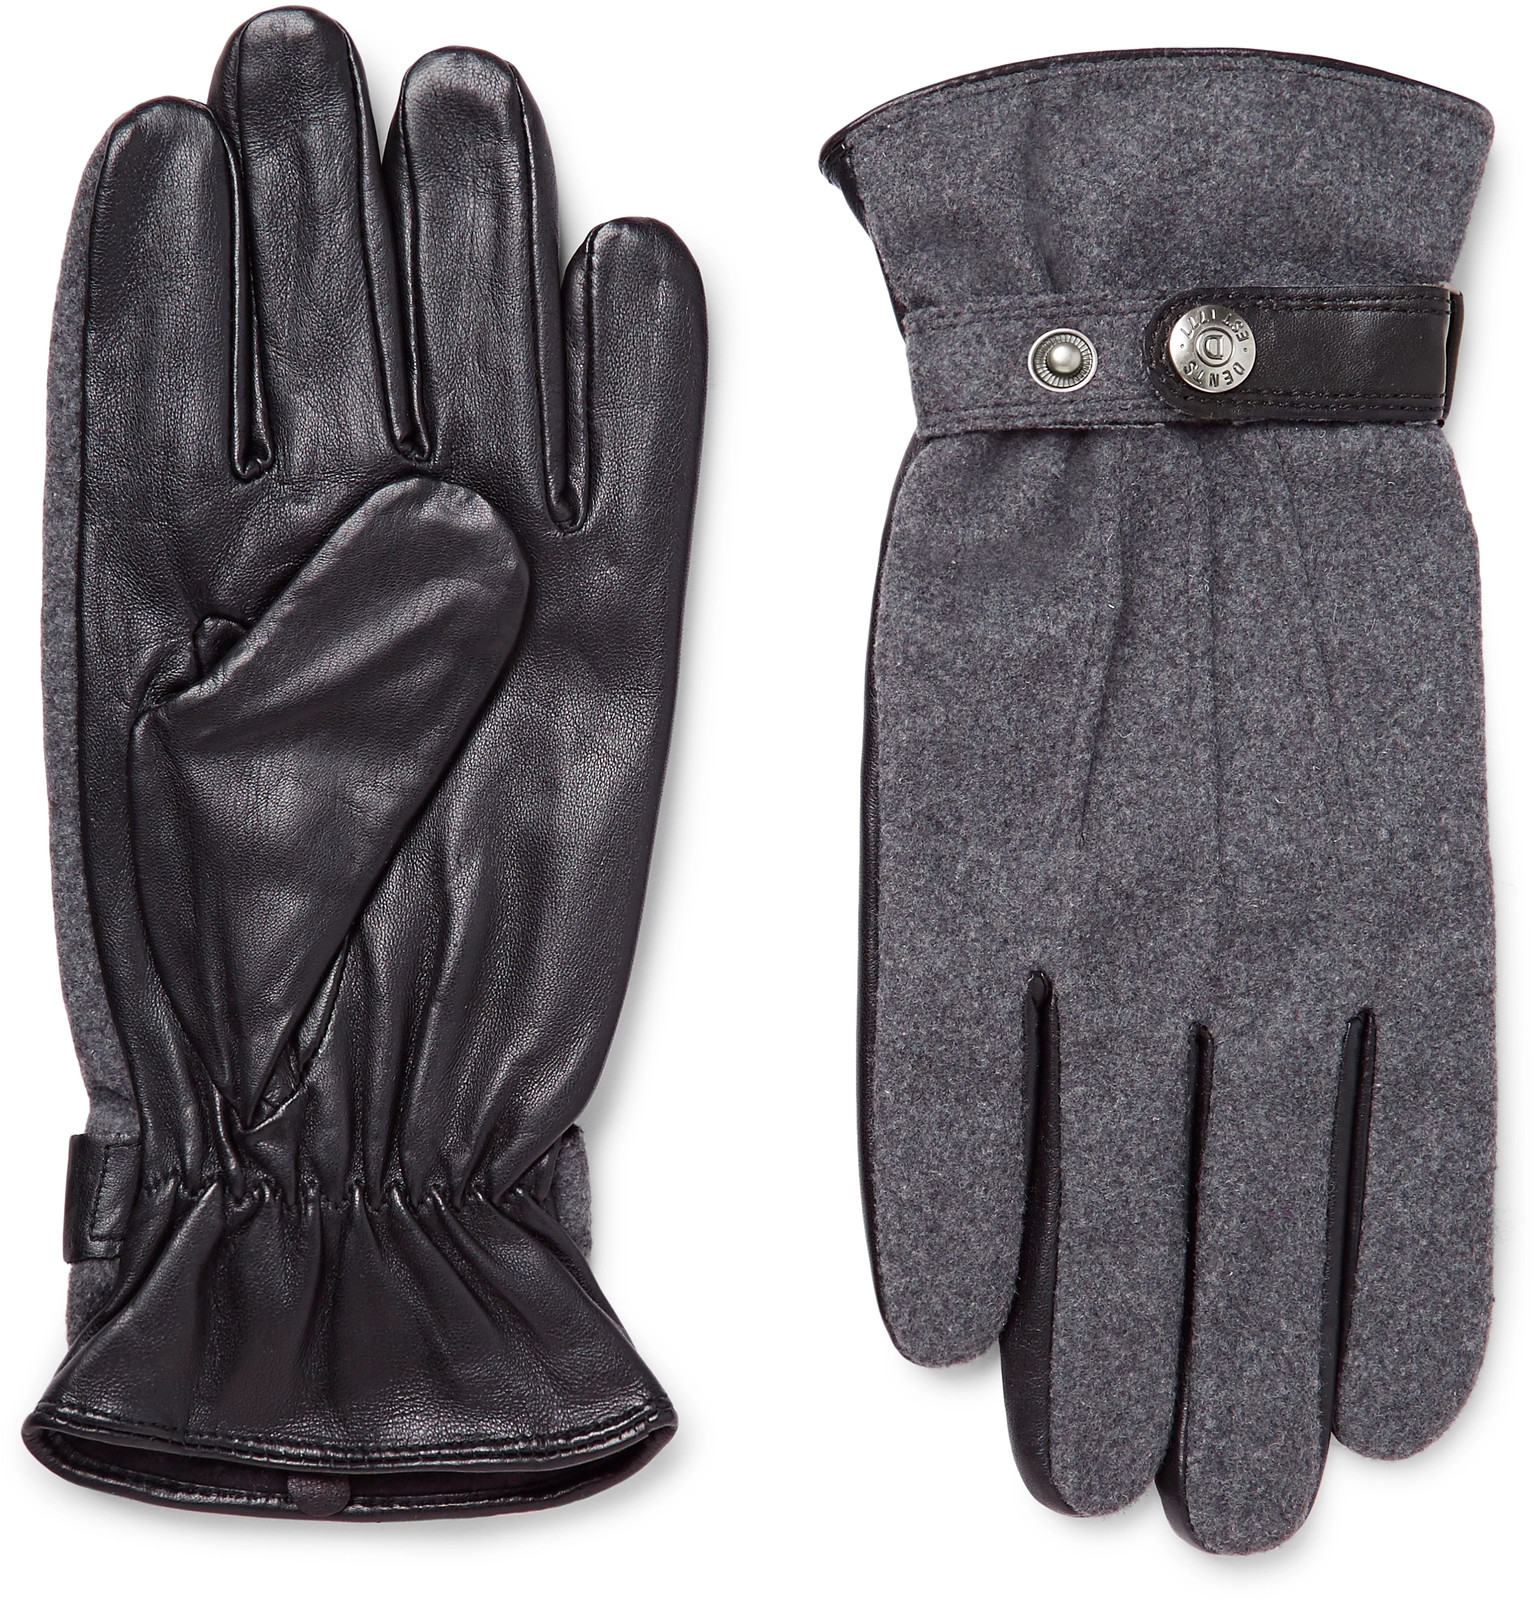 Xxl black leather gloves - Dentsguildford M Lange Flannel And Leather Gloves